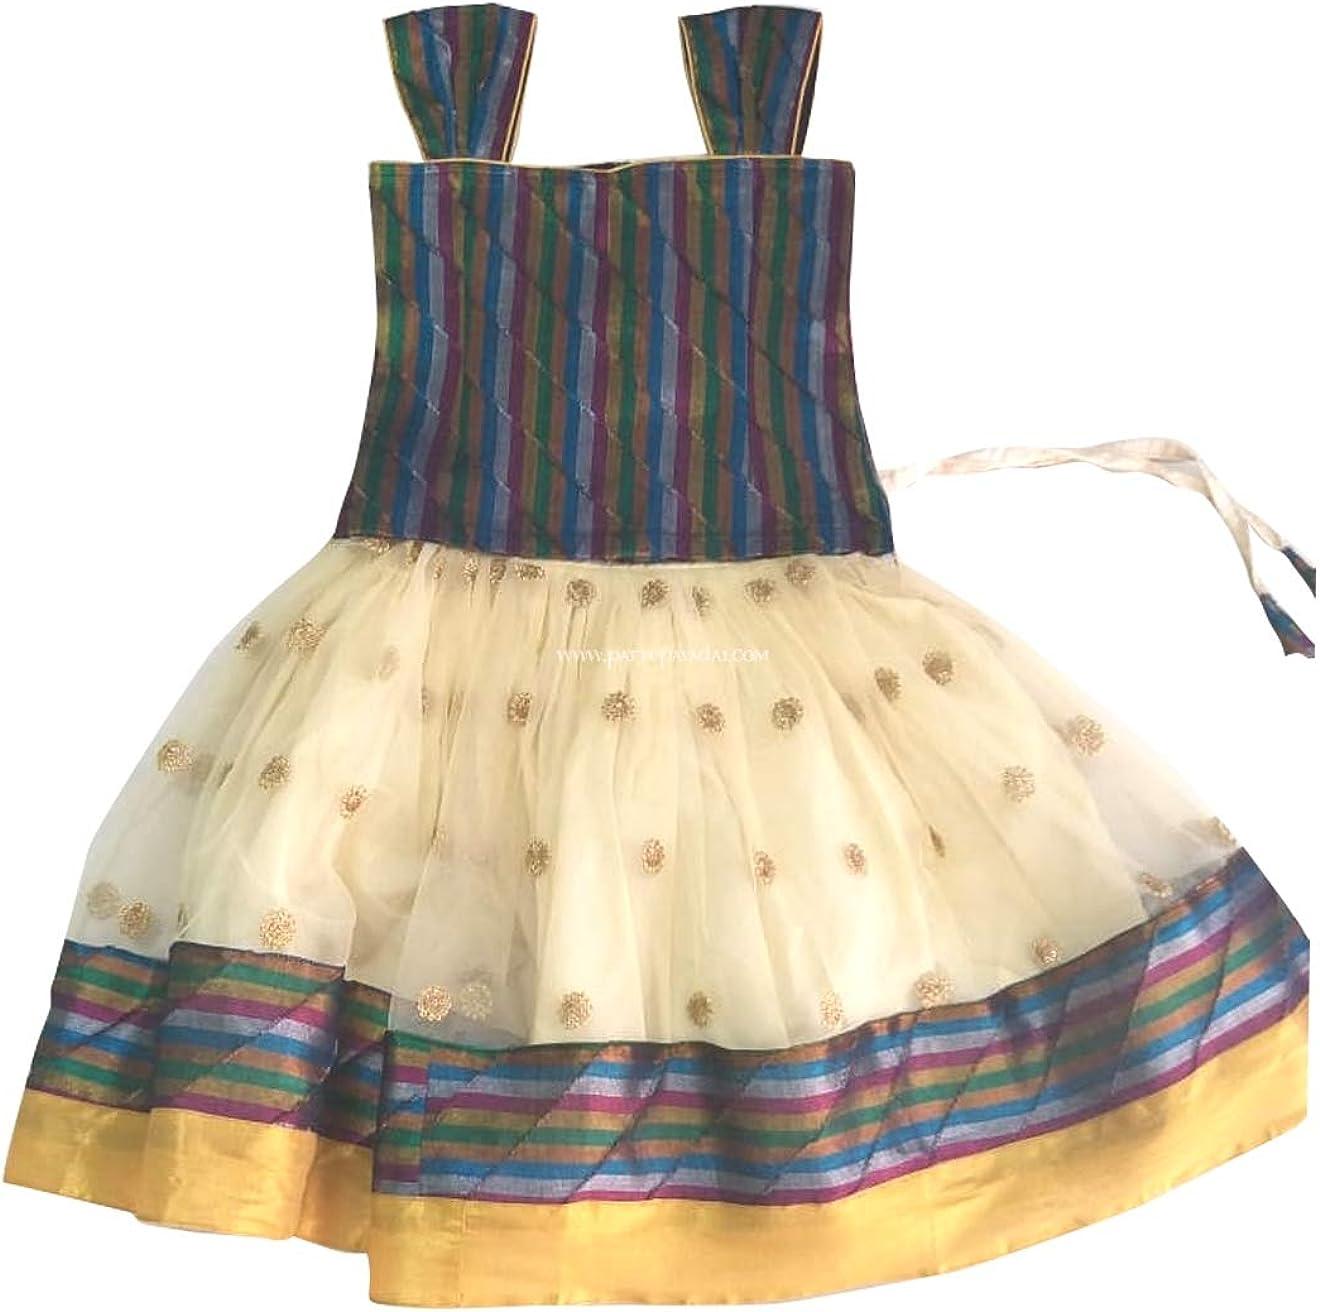 Pattu Pavadai Cream and Multi Netted Fancy Langa for Baby Girls and Kids